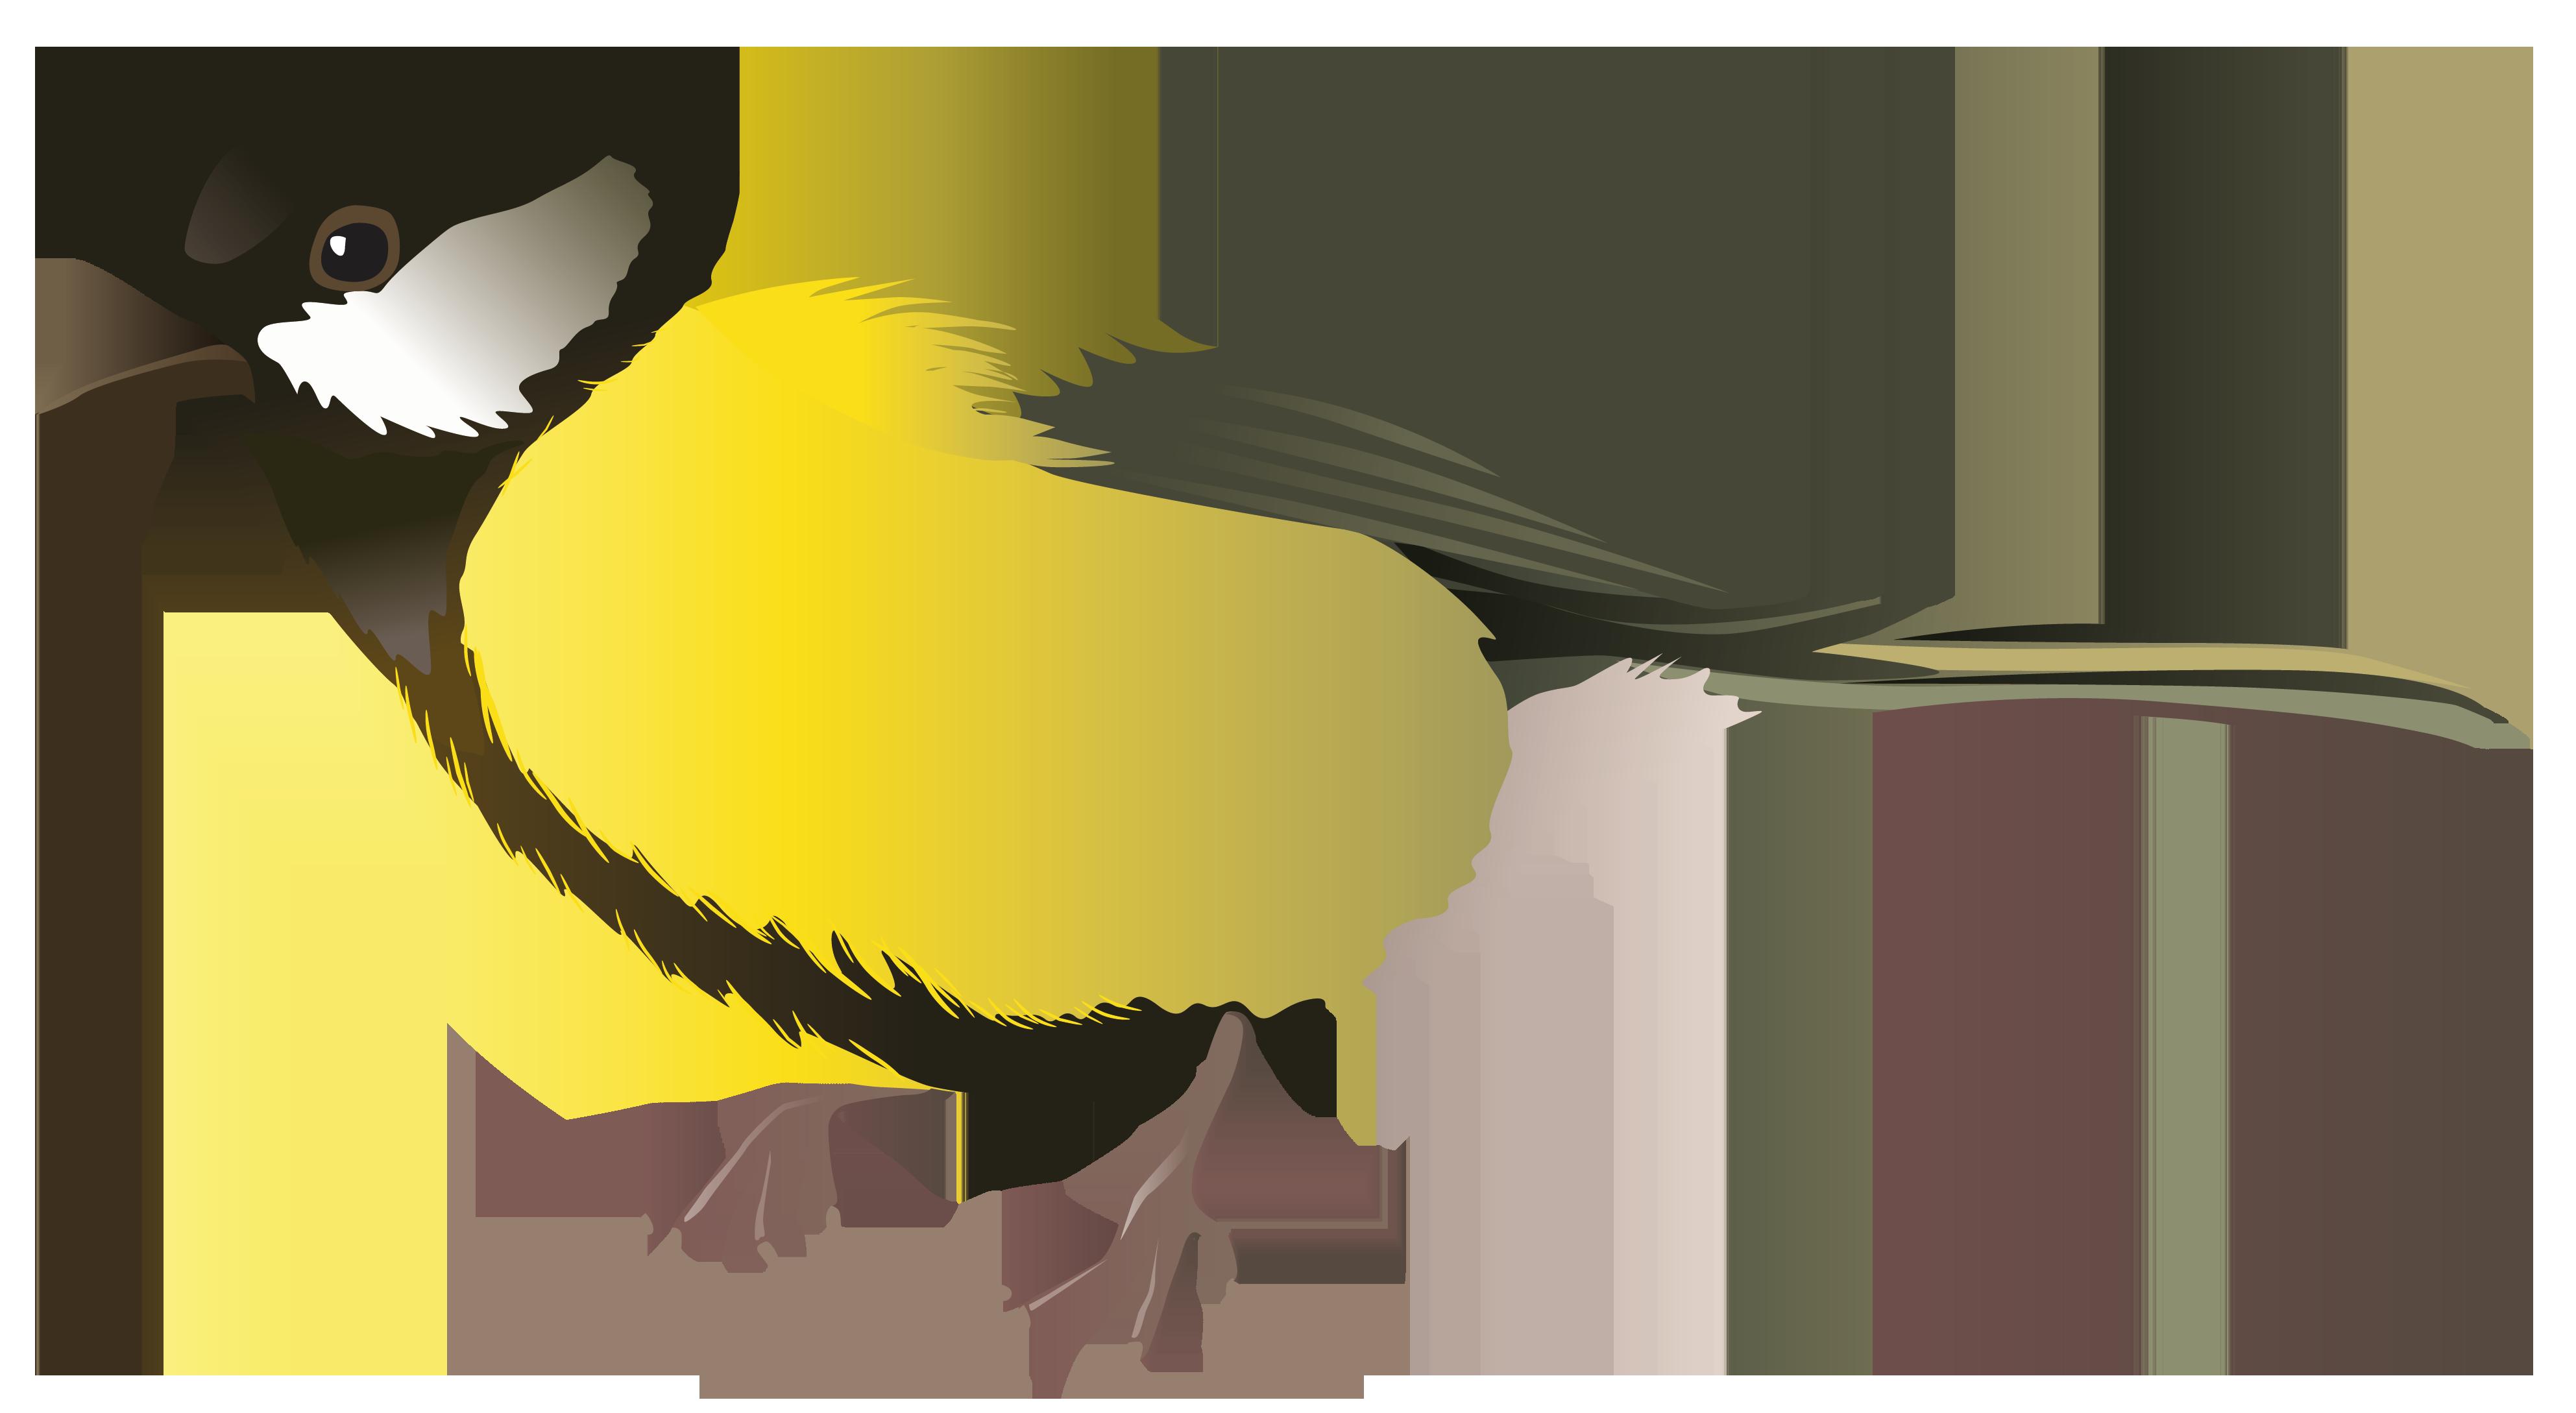 Clipart birds yellow. Bird png image gallery